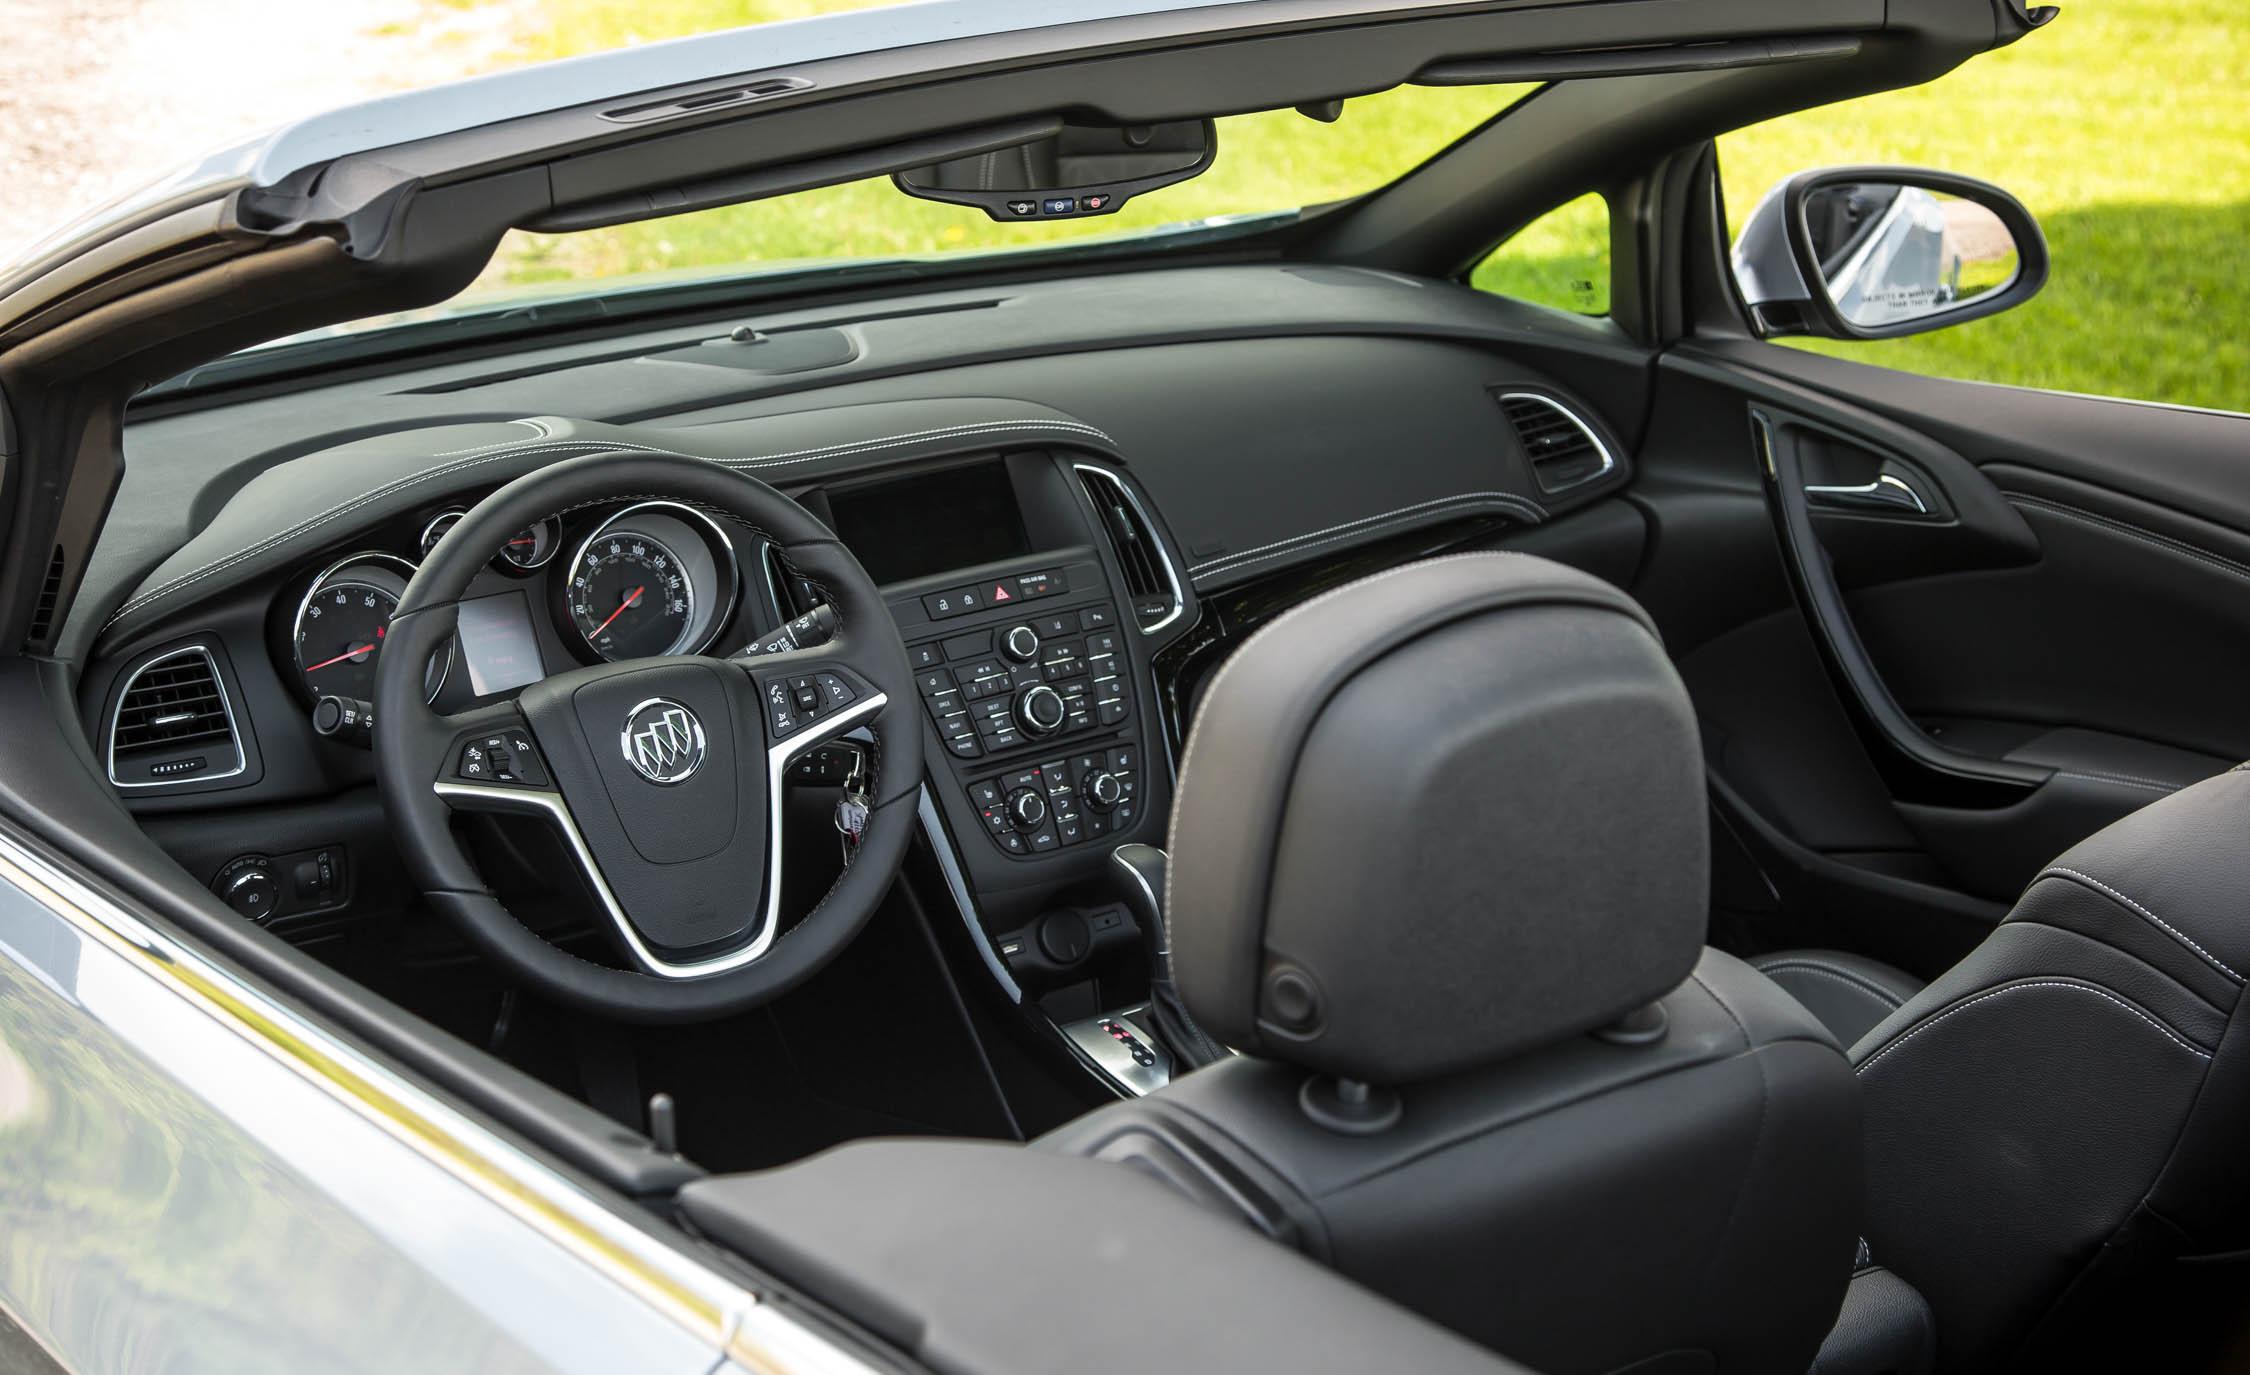 2016 Buick Cascada Premium (Photo 5 of 24)